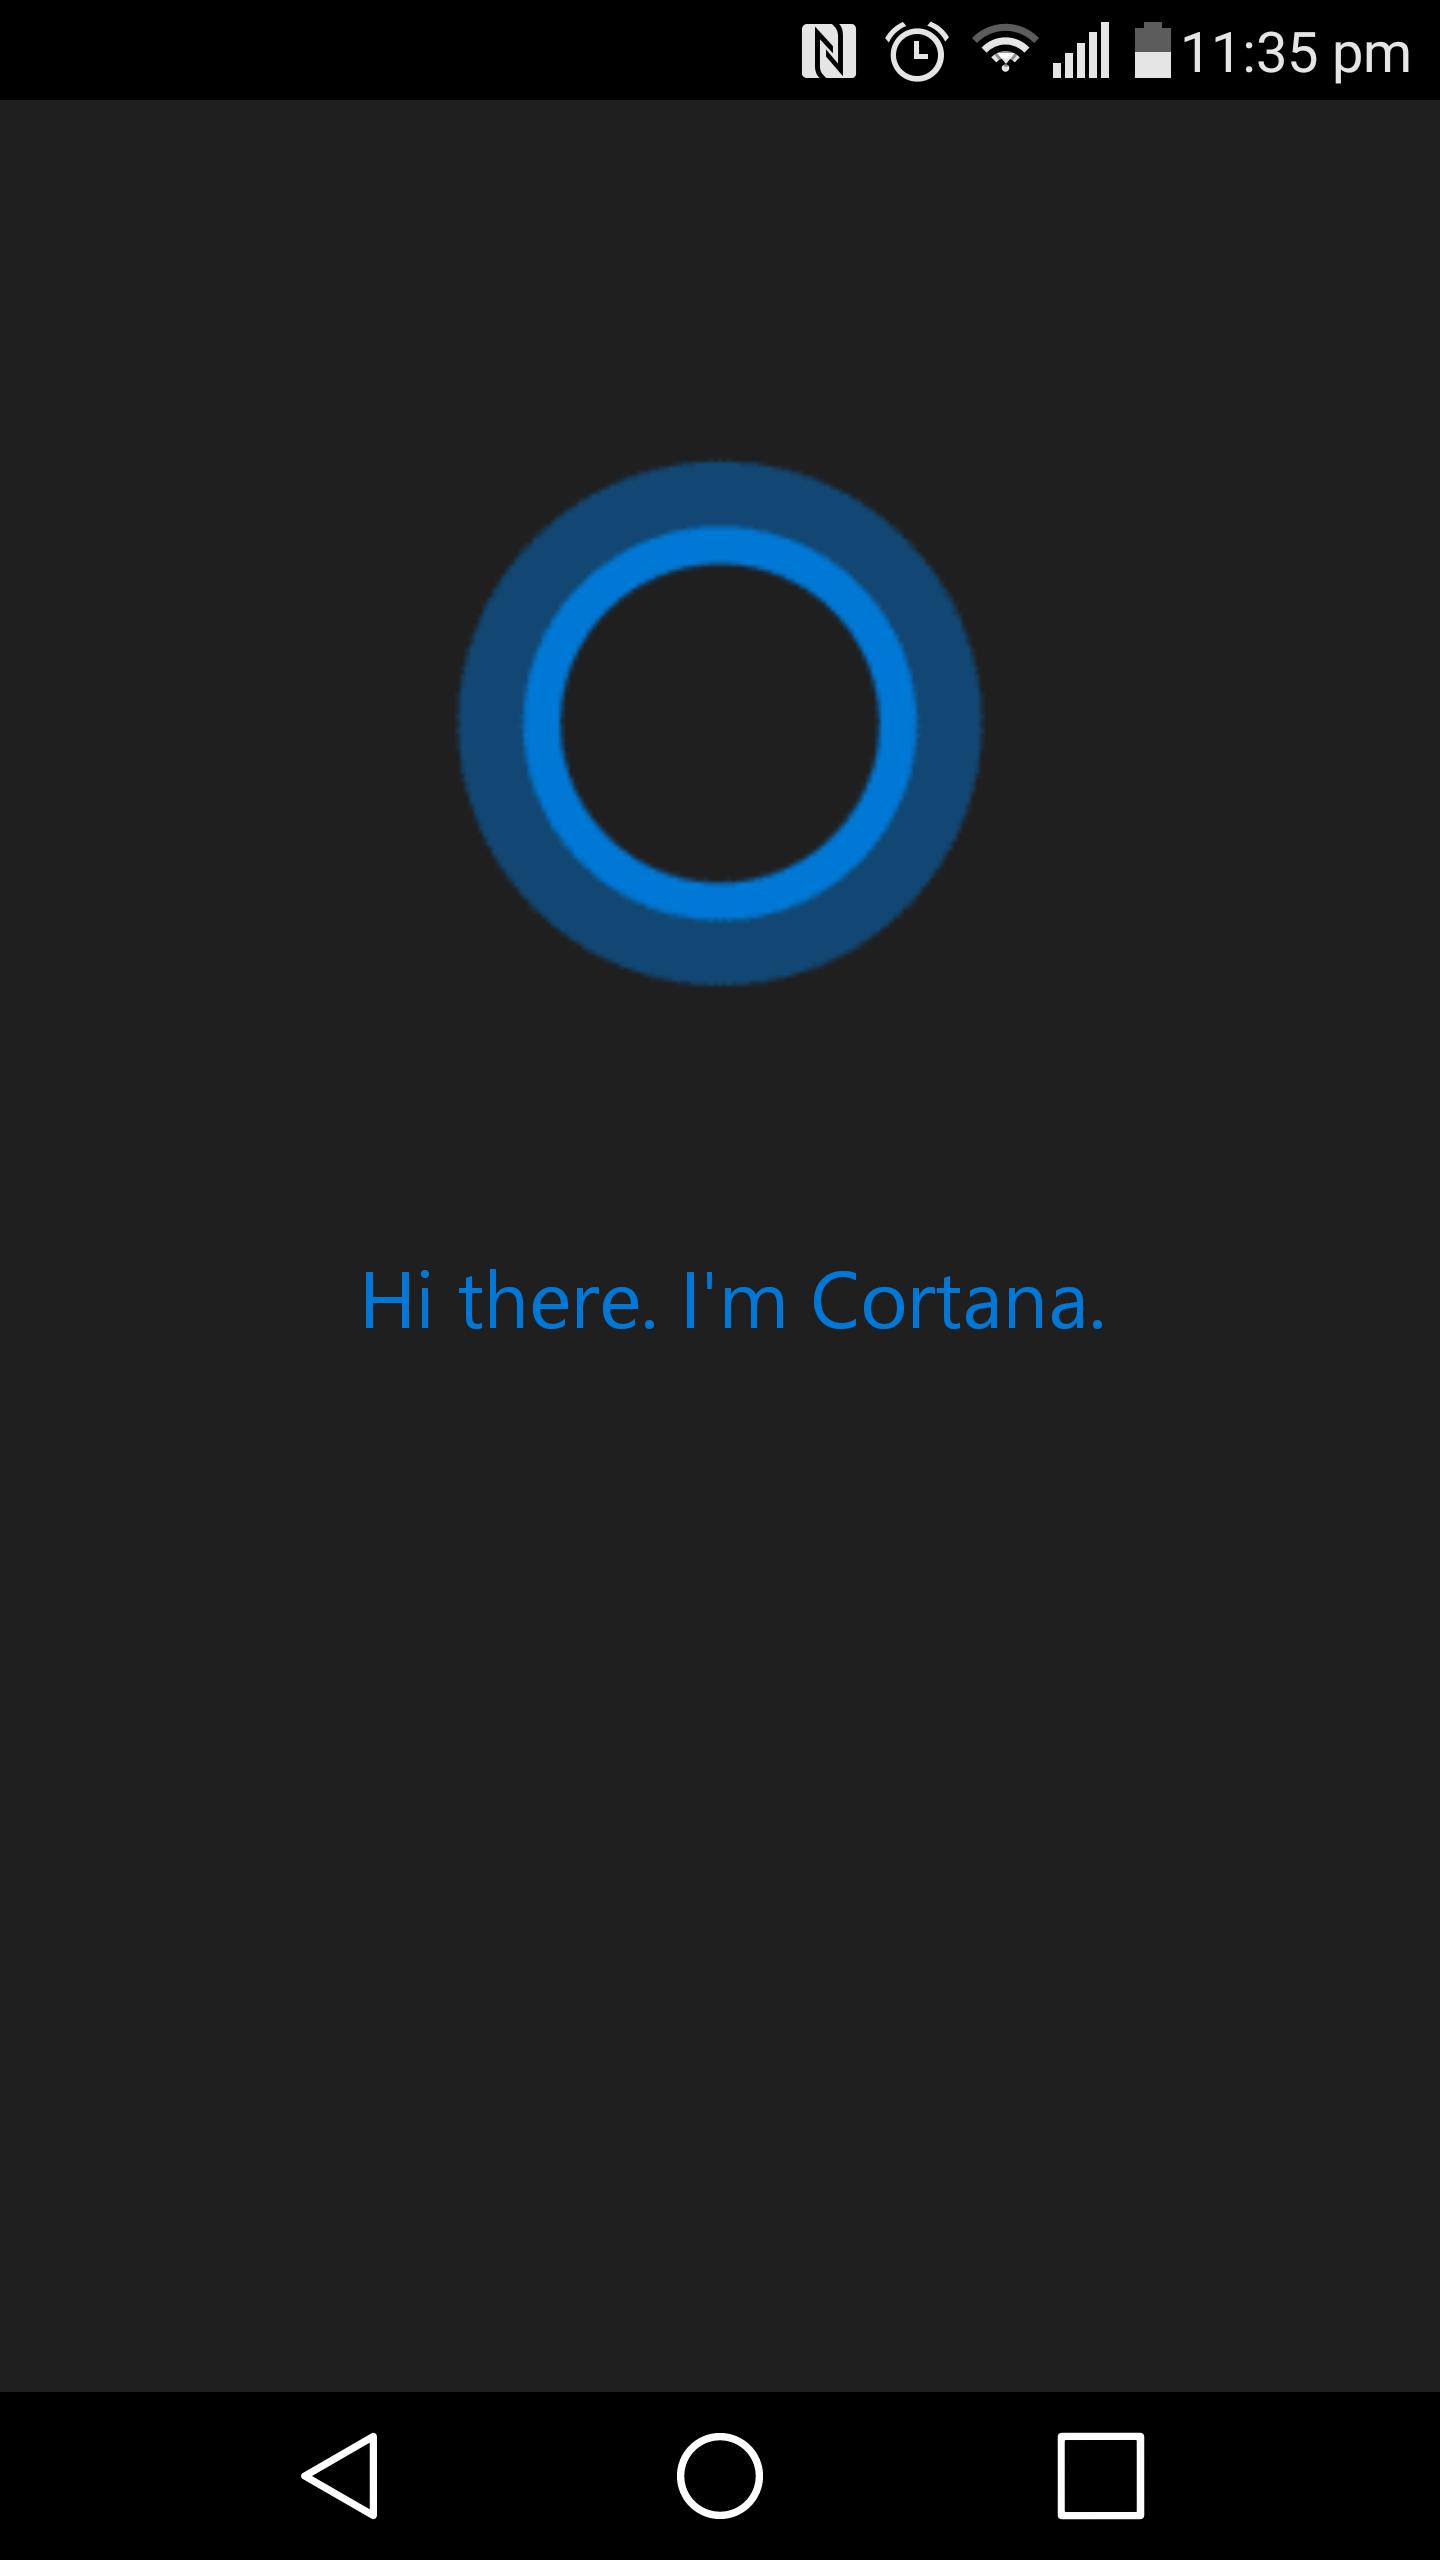 50+ Cortana Live Wallpaper for Android on WallpaperSafari